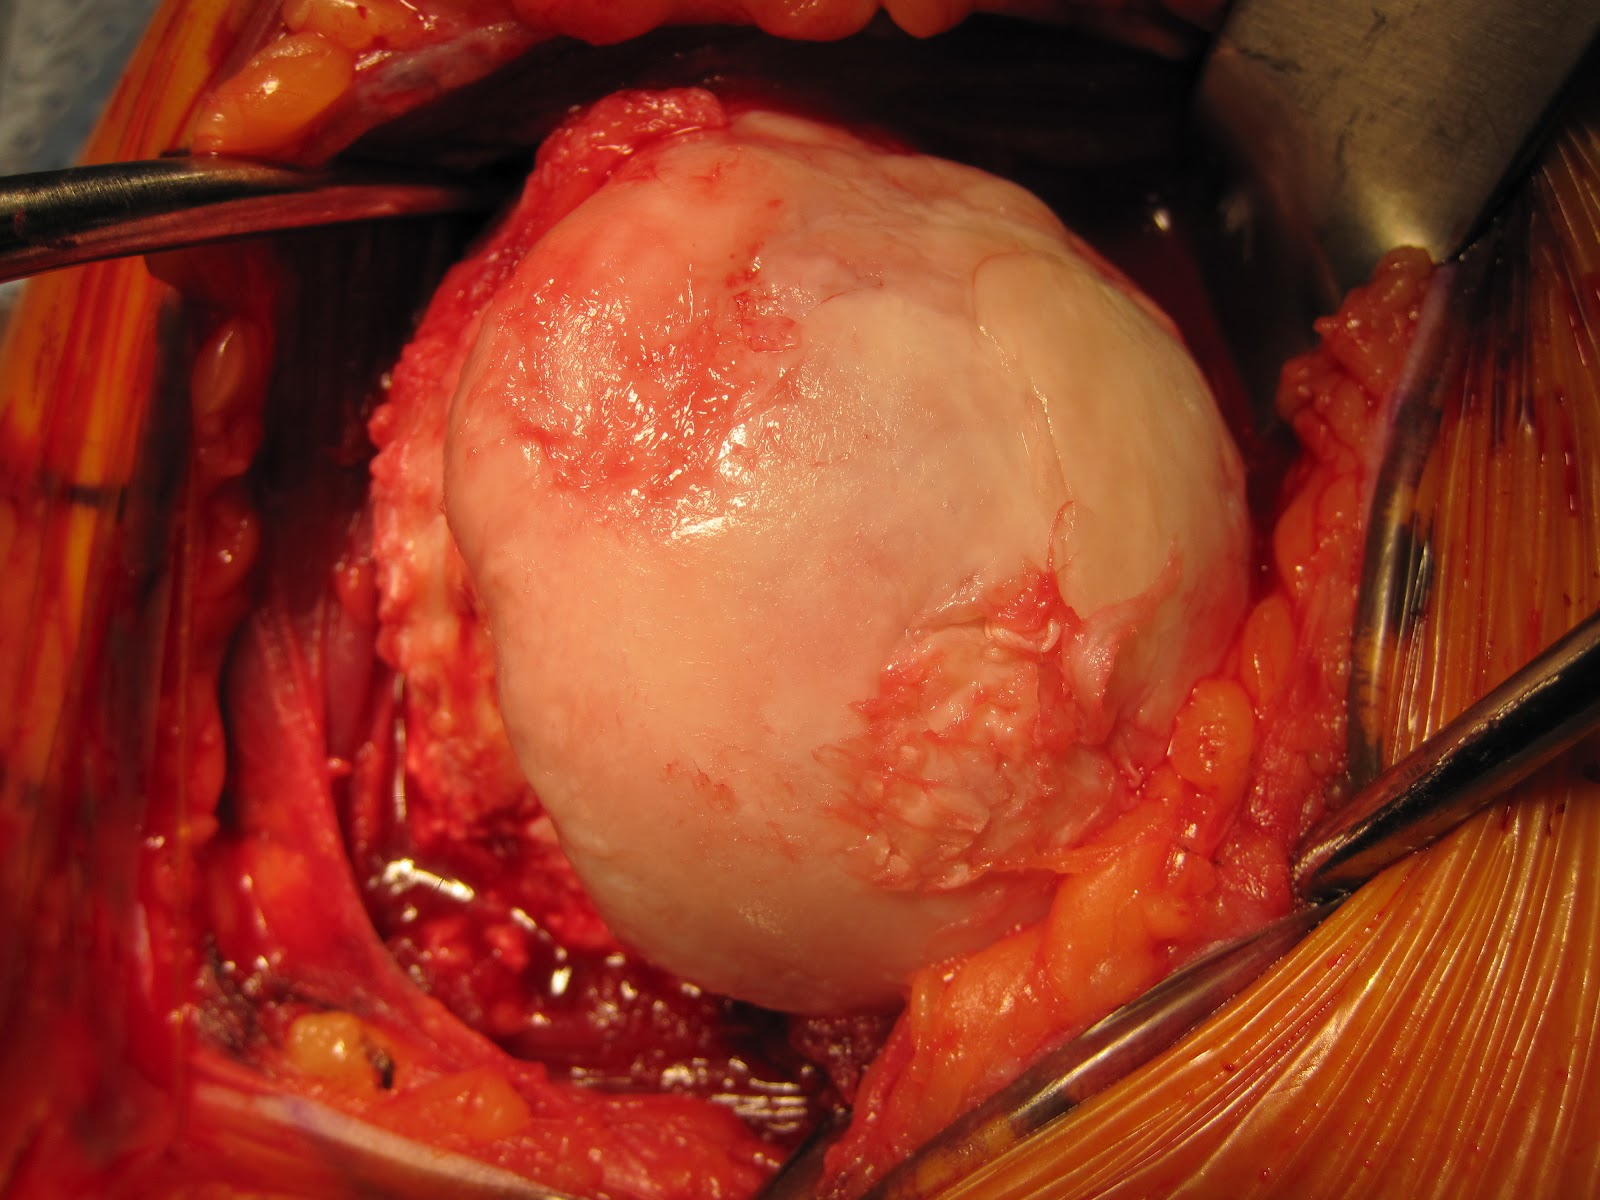 Shoulder Arthritis / Rotator Cuff Tears: causes of ...